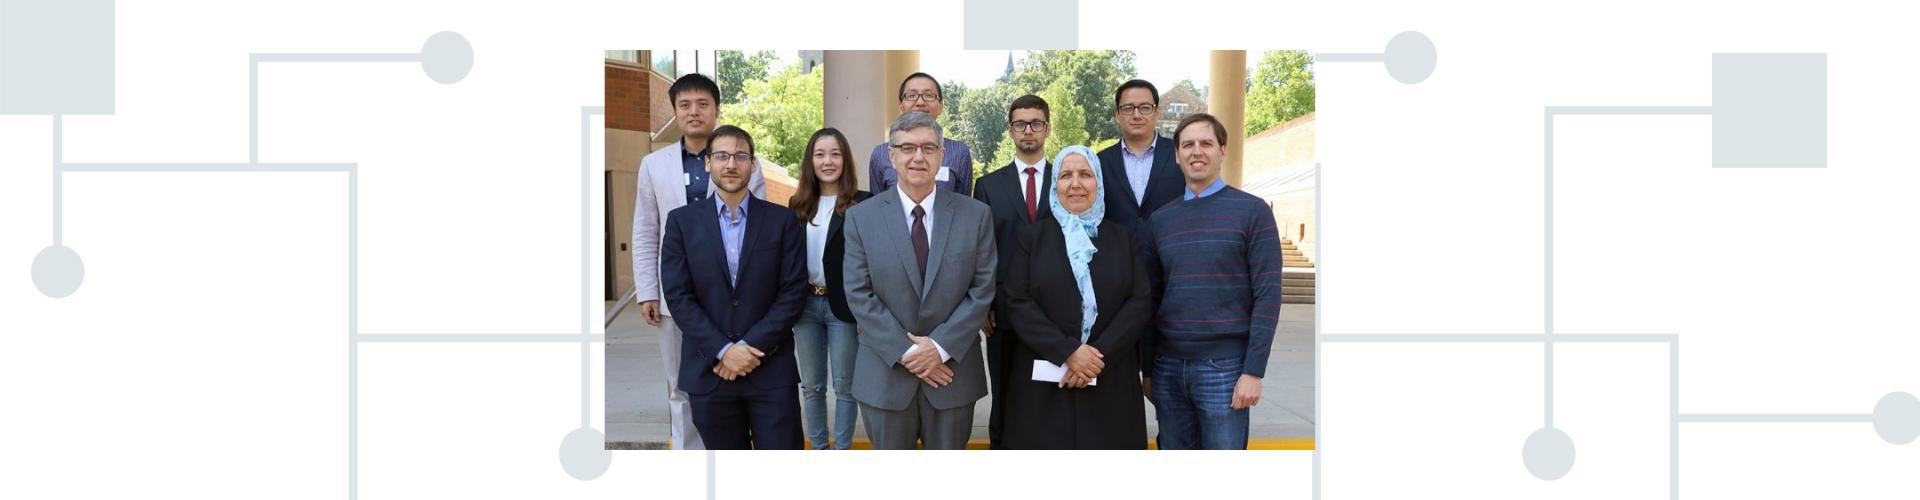 Lehigh Engineering faculty hires deepen interdisciplinary strength